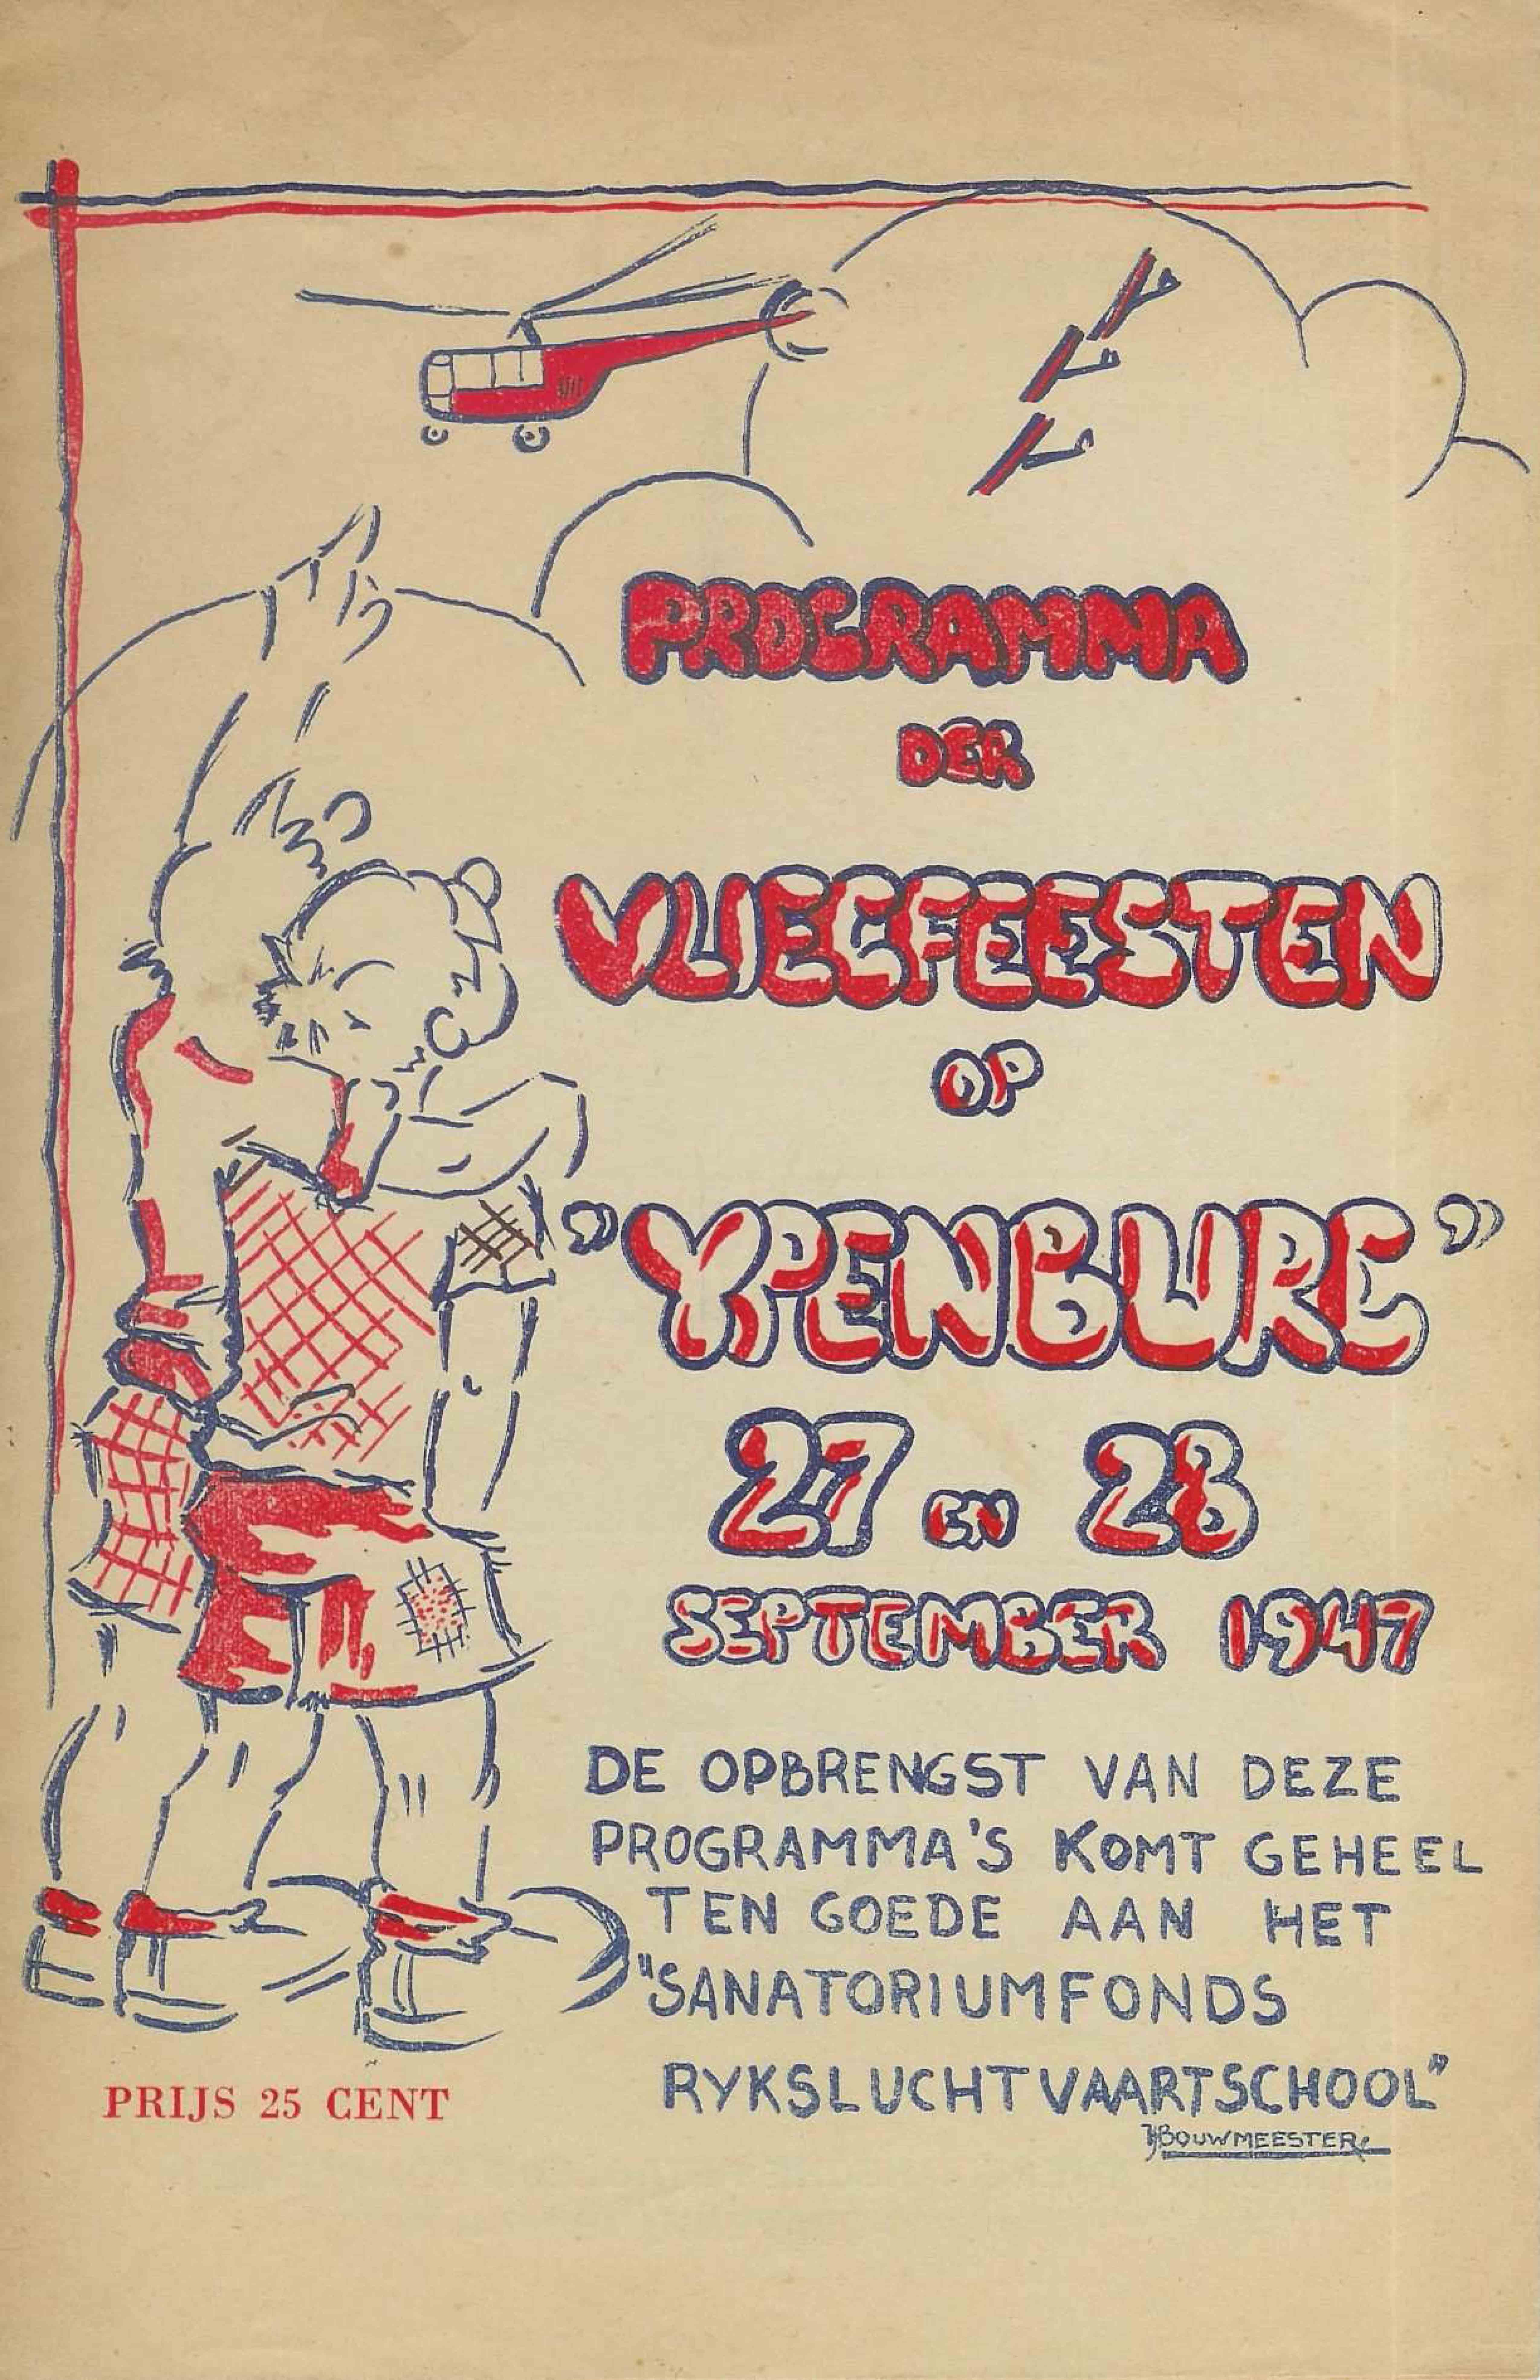 vliegfeest 27 en 28 sept 1947